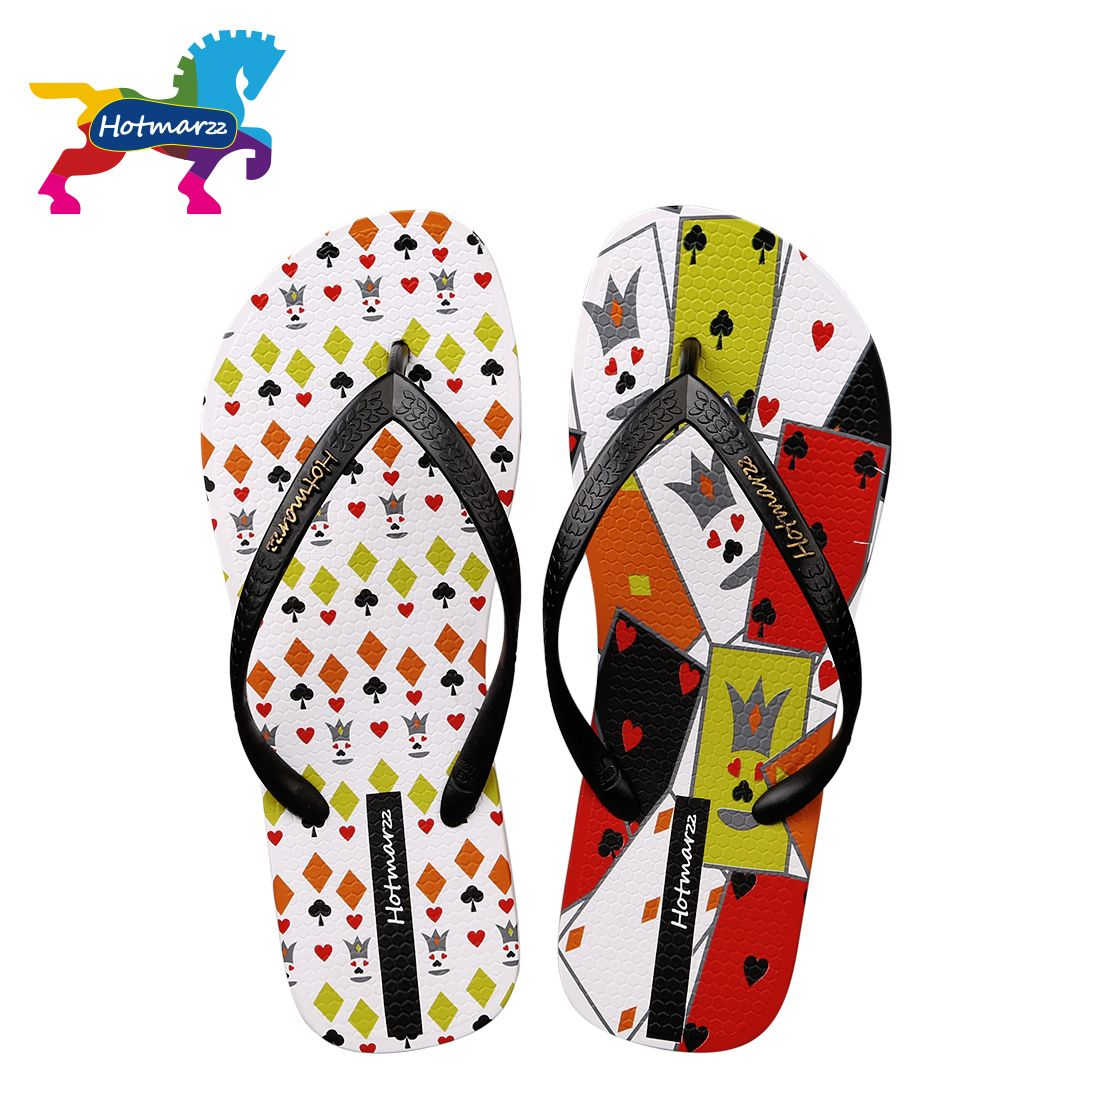 d7380fa45c4f Hotmarzz Women Stylish Poker Print Flat Flip Flops Beach Slippers Shoes  Ladies Home House Summer Thong Sandals Wedding Flip-flop